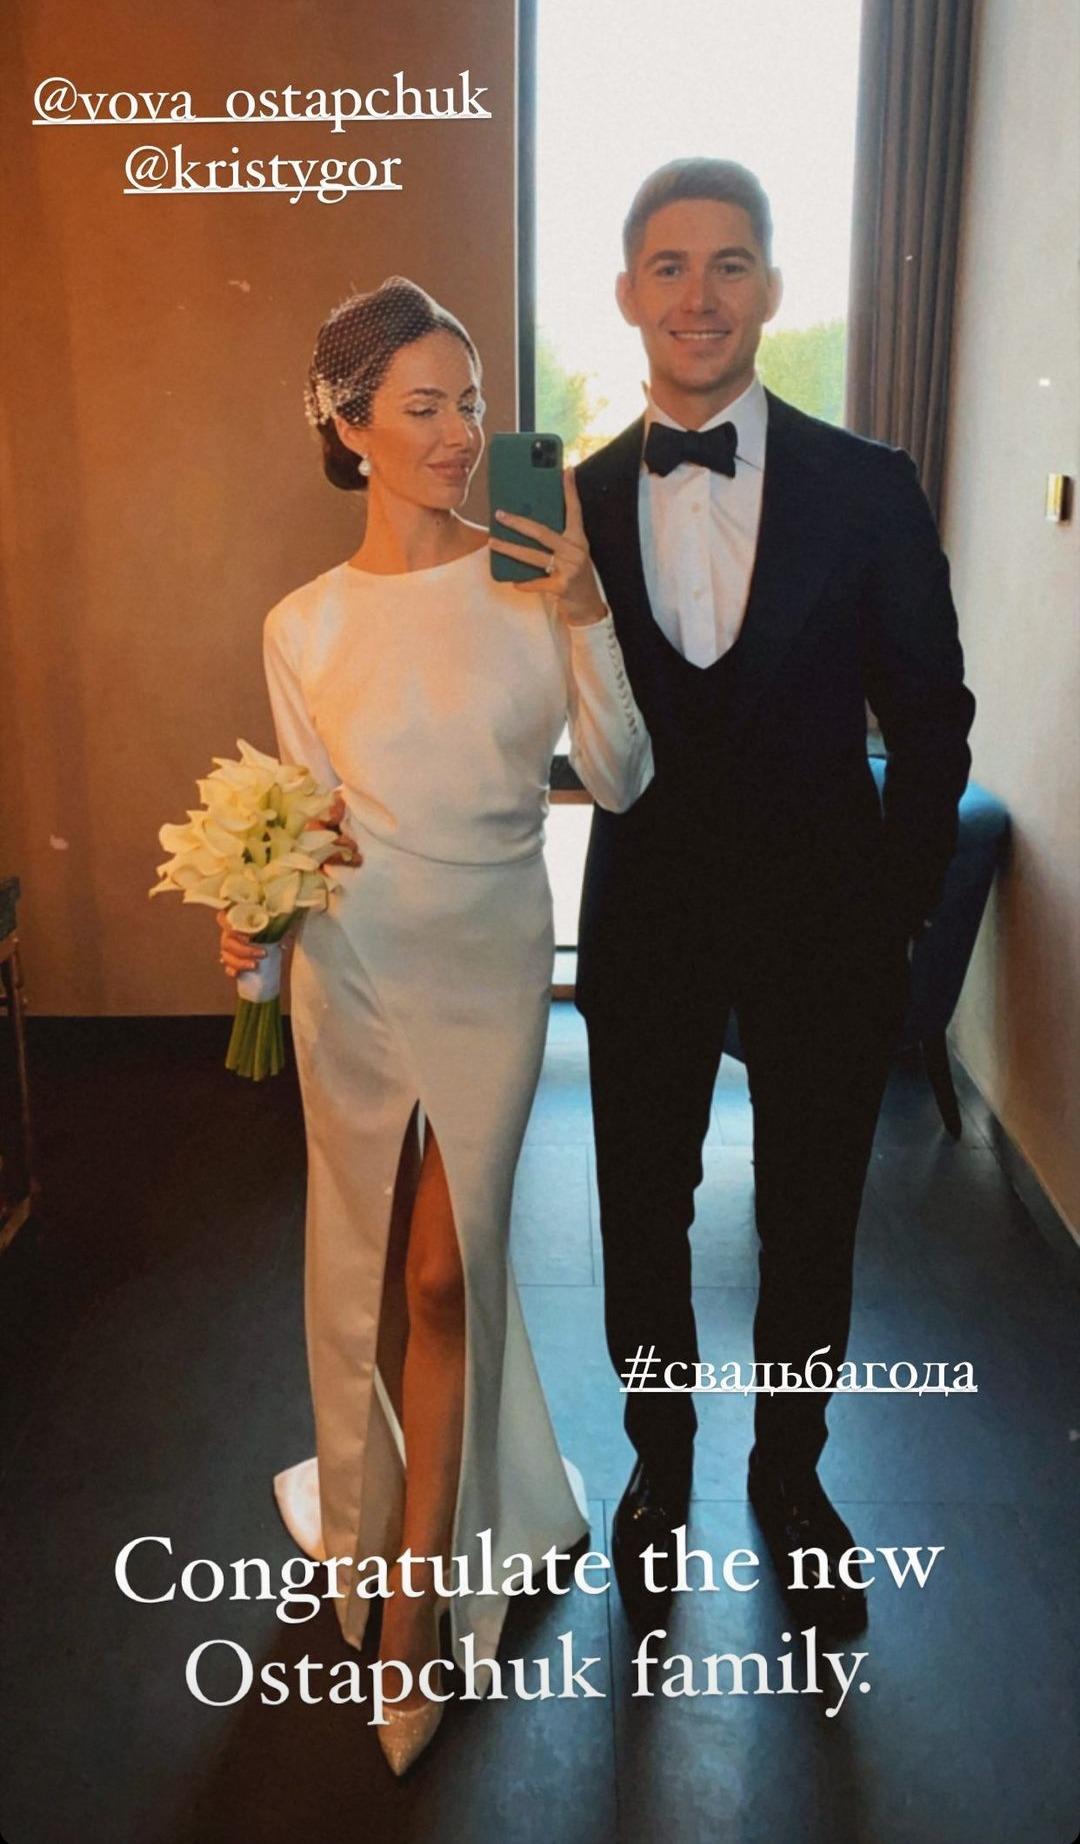 свадьба остапчука